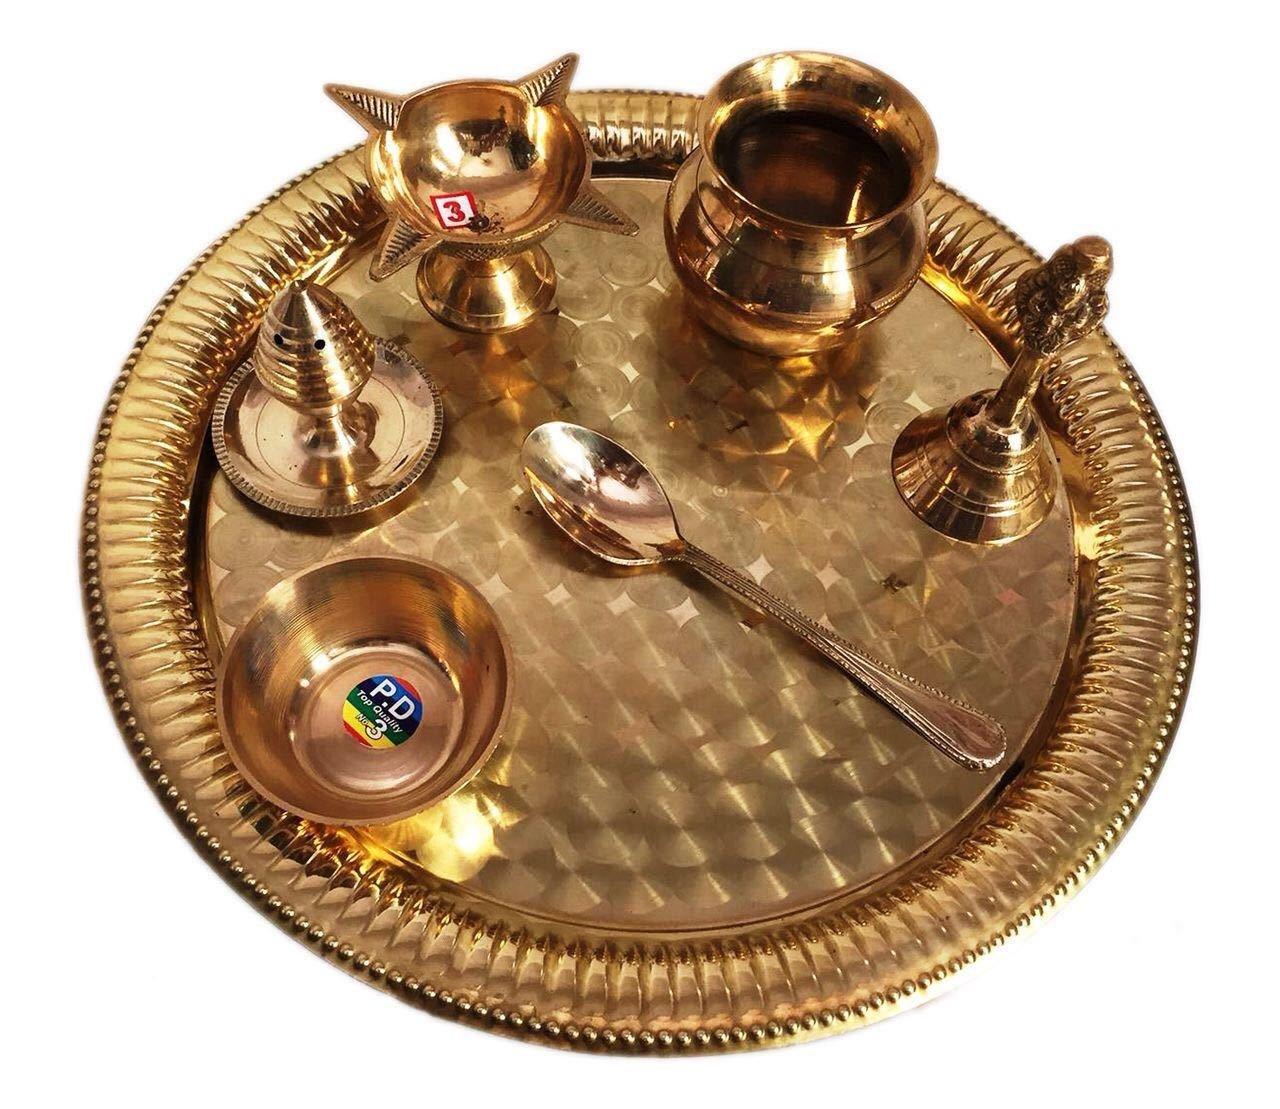 MegaCraft Home & Temple Puja Use Handmade Designer Brass Stylish Set Brass Product